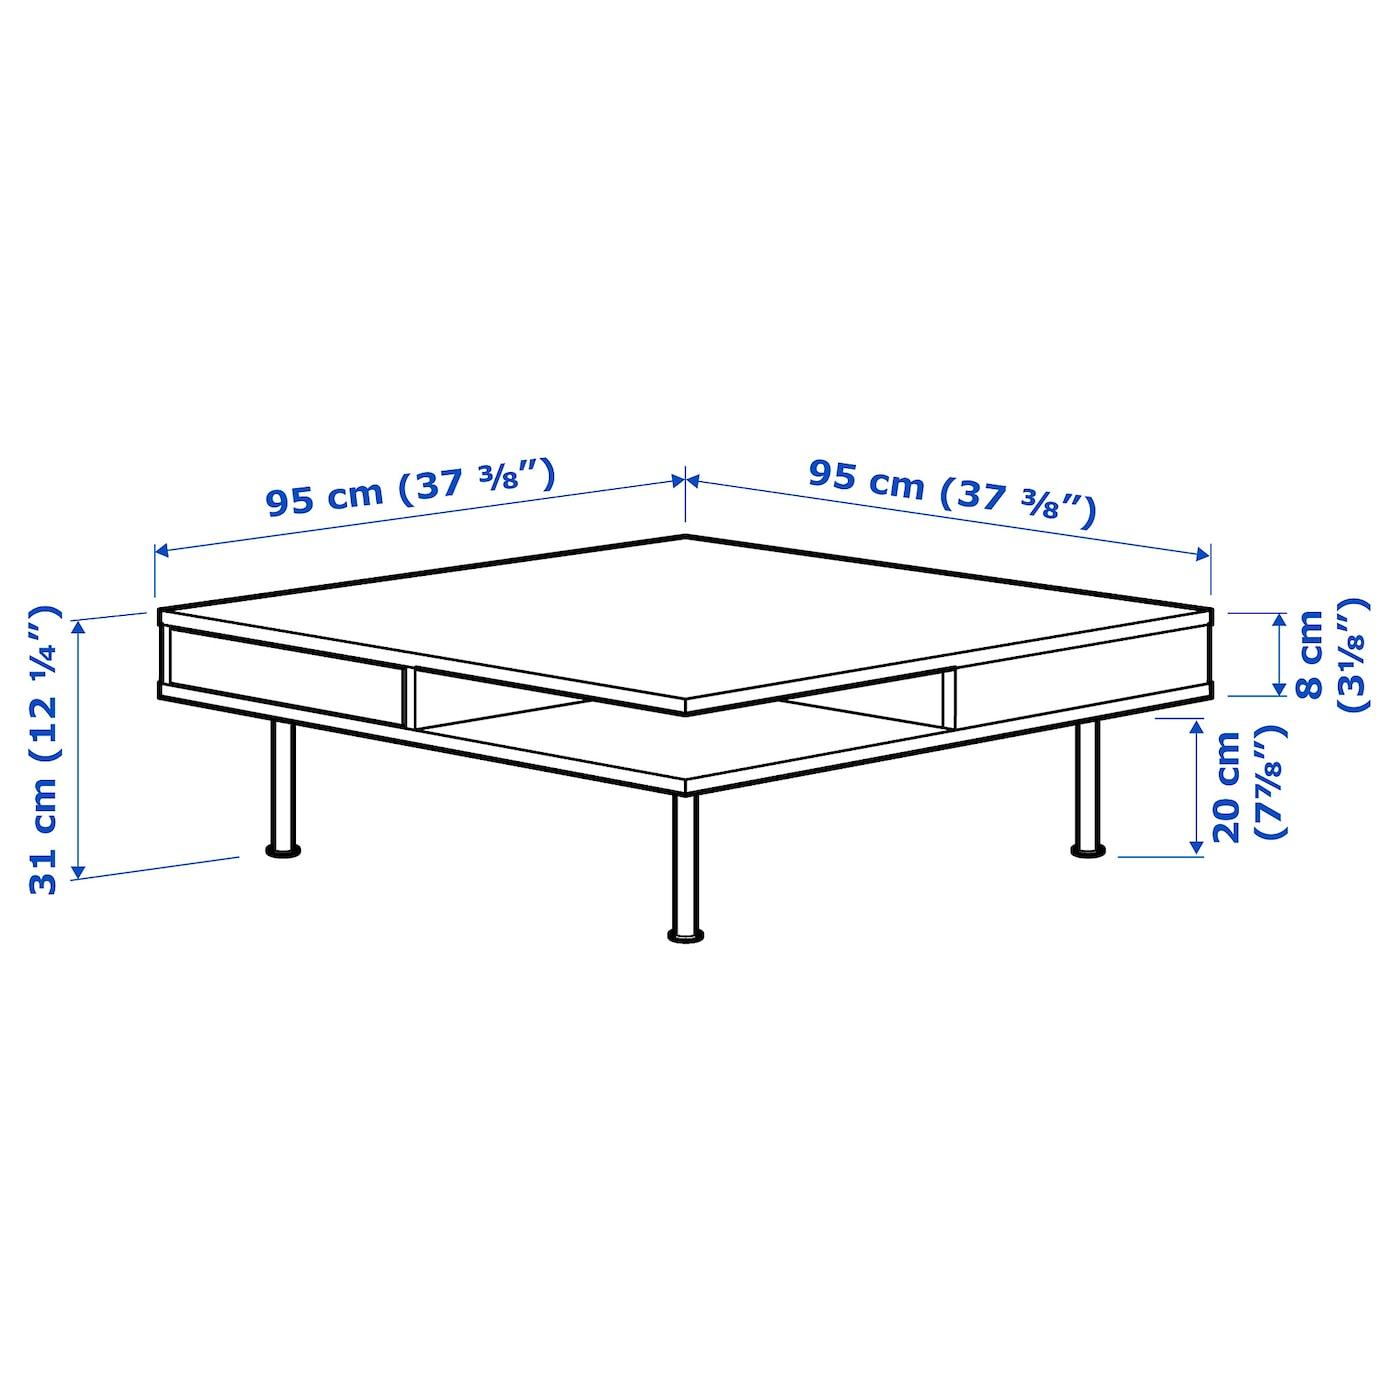 Tofteryd Coffee Table High Gloss White 373 8x373 8 95x95 Cm Ikea [ 1400 x 1400 Pixel ]